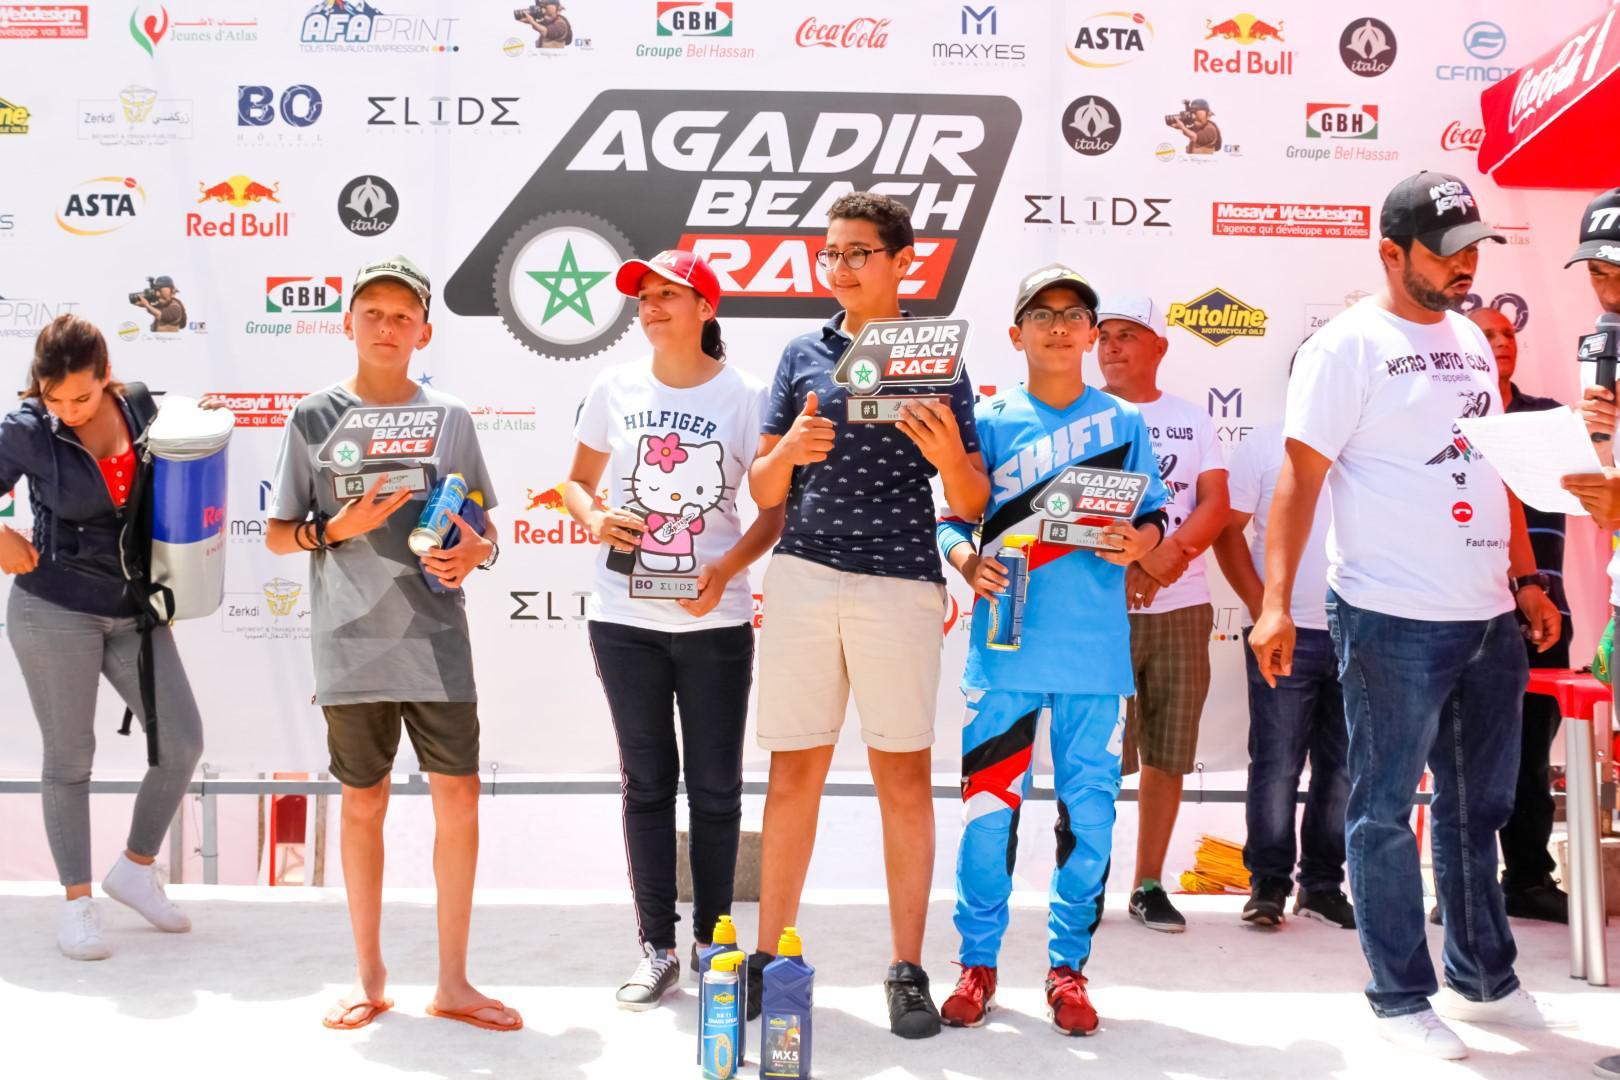 agadir-beach-race-la-reussite-791-11.jpg